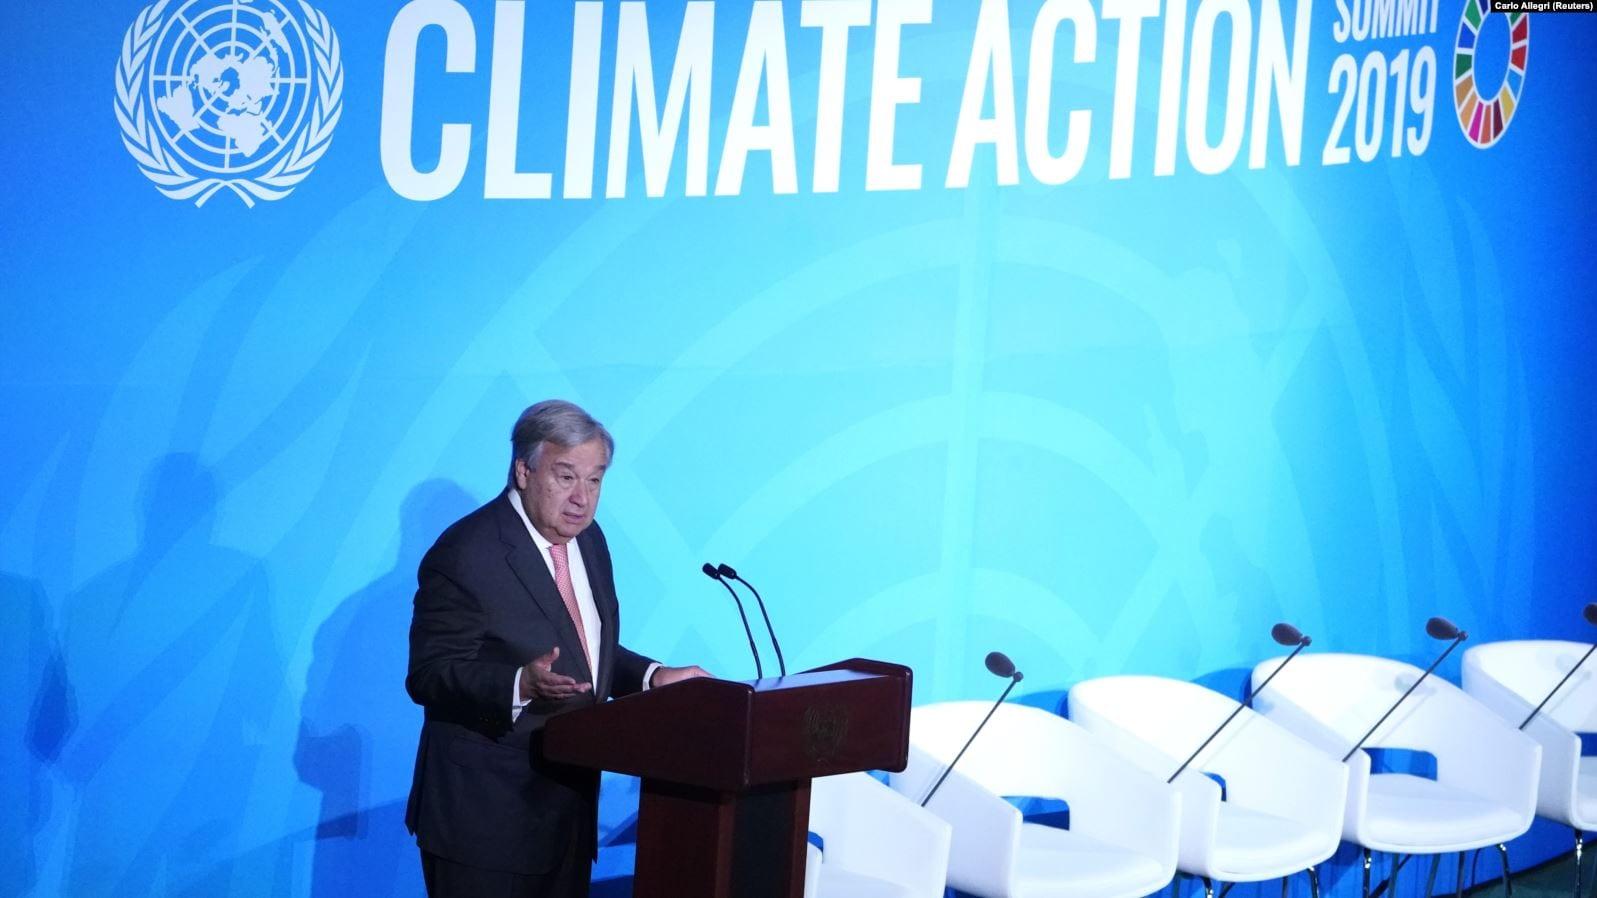 Antonio Guterres Speaking at the UN Climate Action Summit 2019